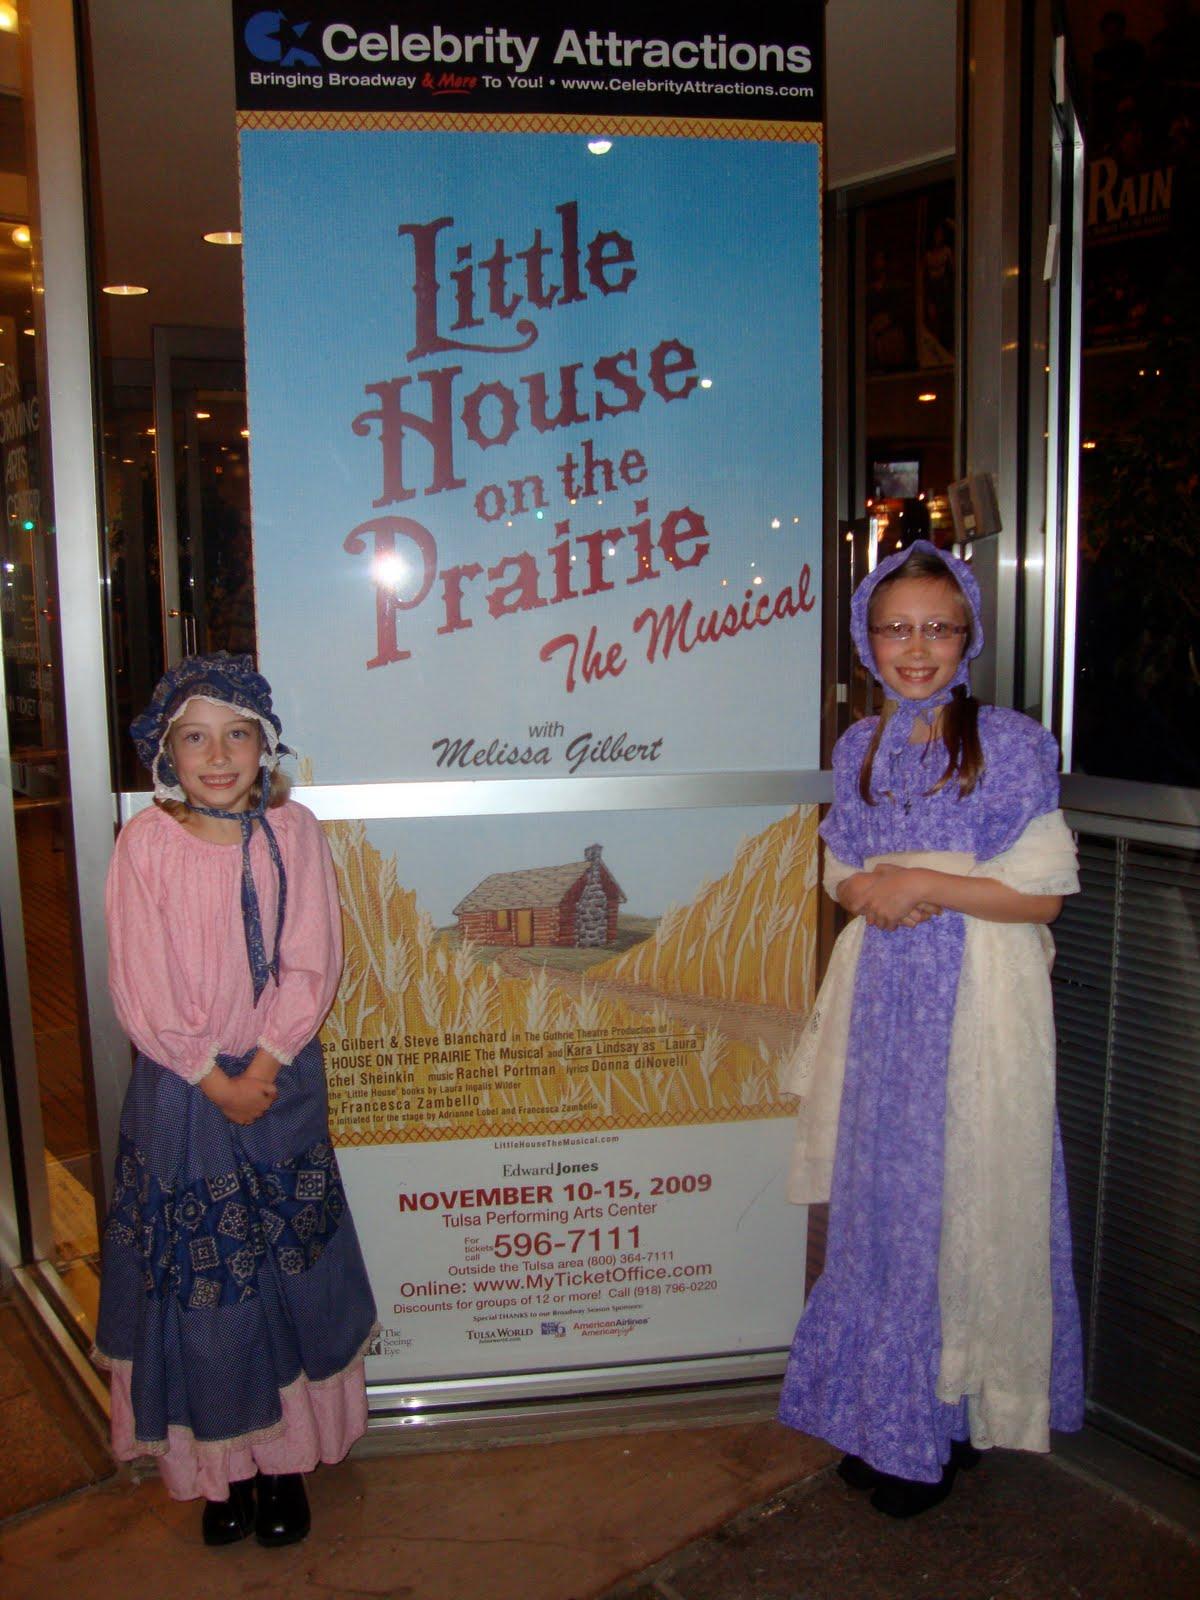 Mom Of 2 Girly Girlz Little House On The Prairie Musical